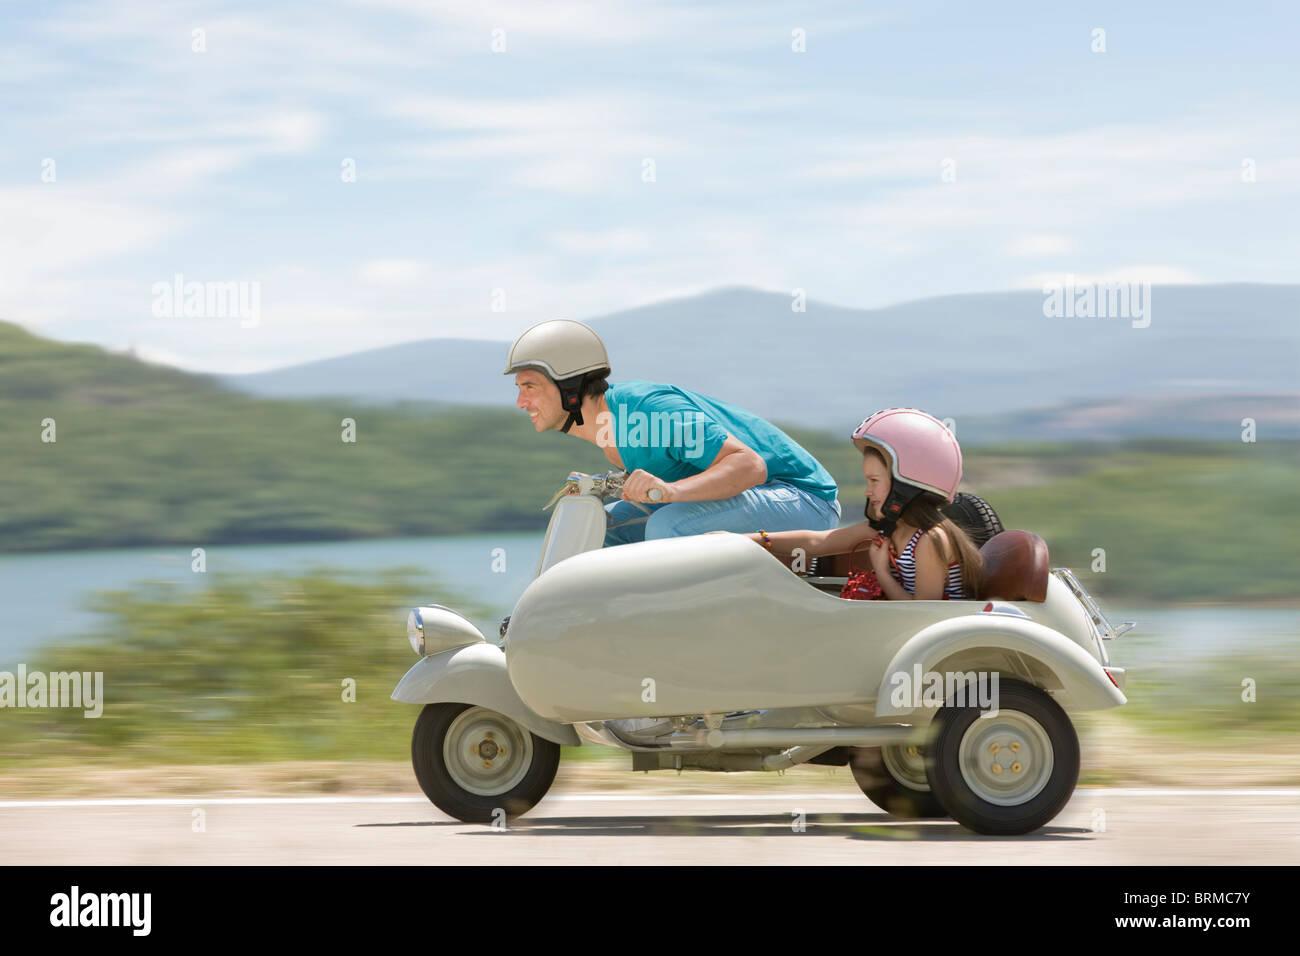 Viaje rápido Imagen De Stock